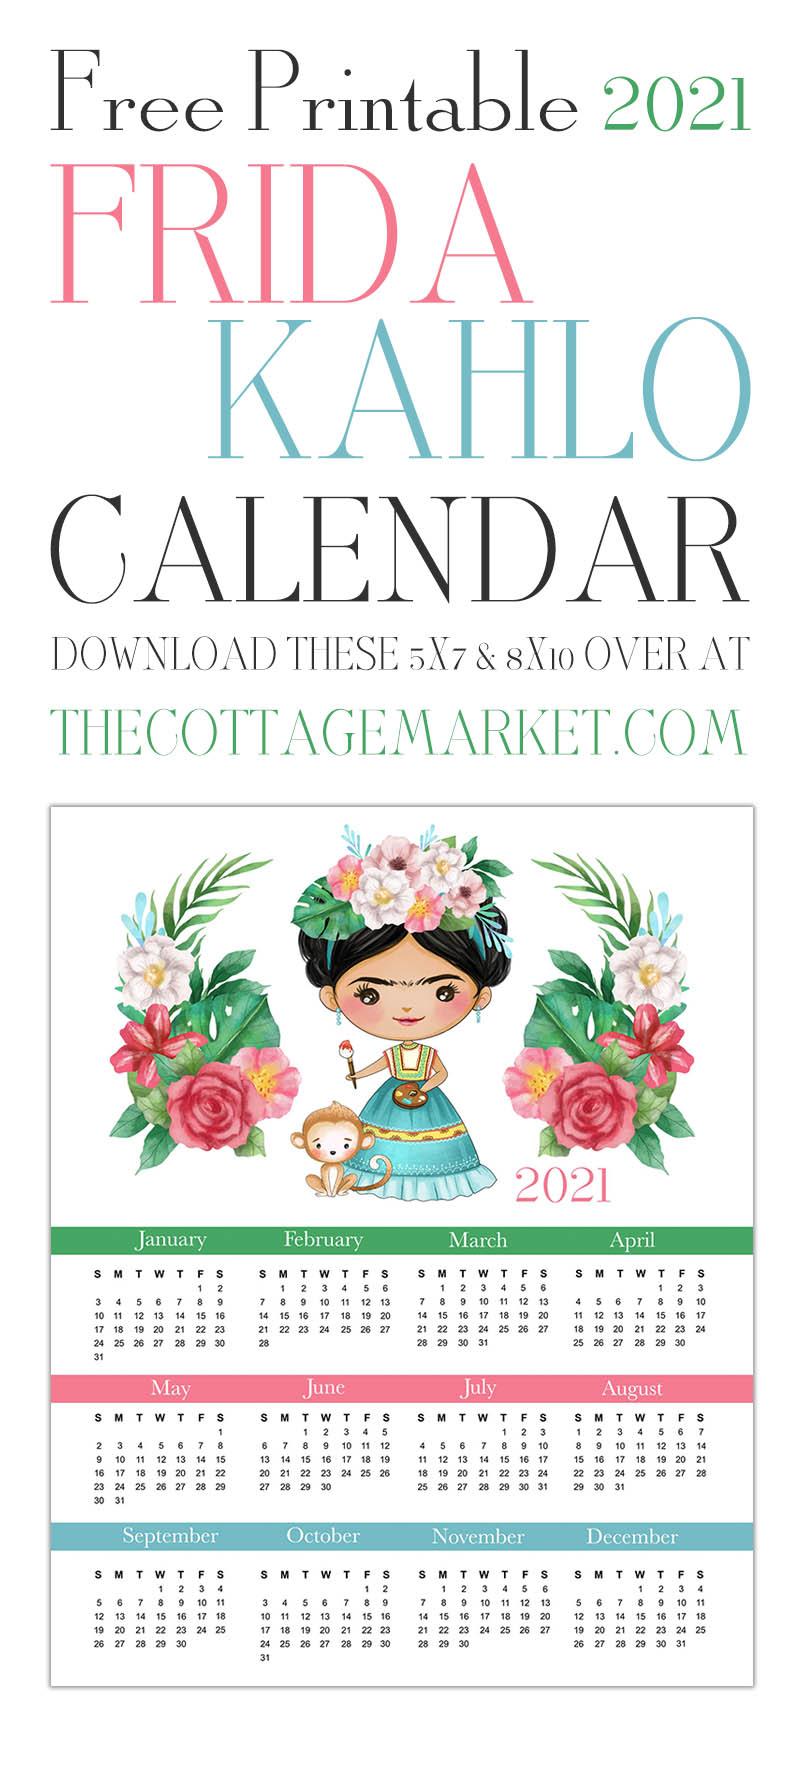 https://thecottagemarket.com/wp-content/uploads/2020/12/tcm-2021-Frida-onepage-calendar-T-1.jpg